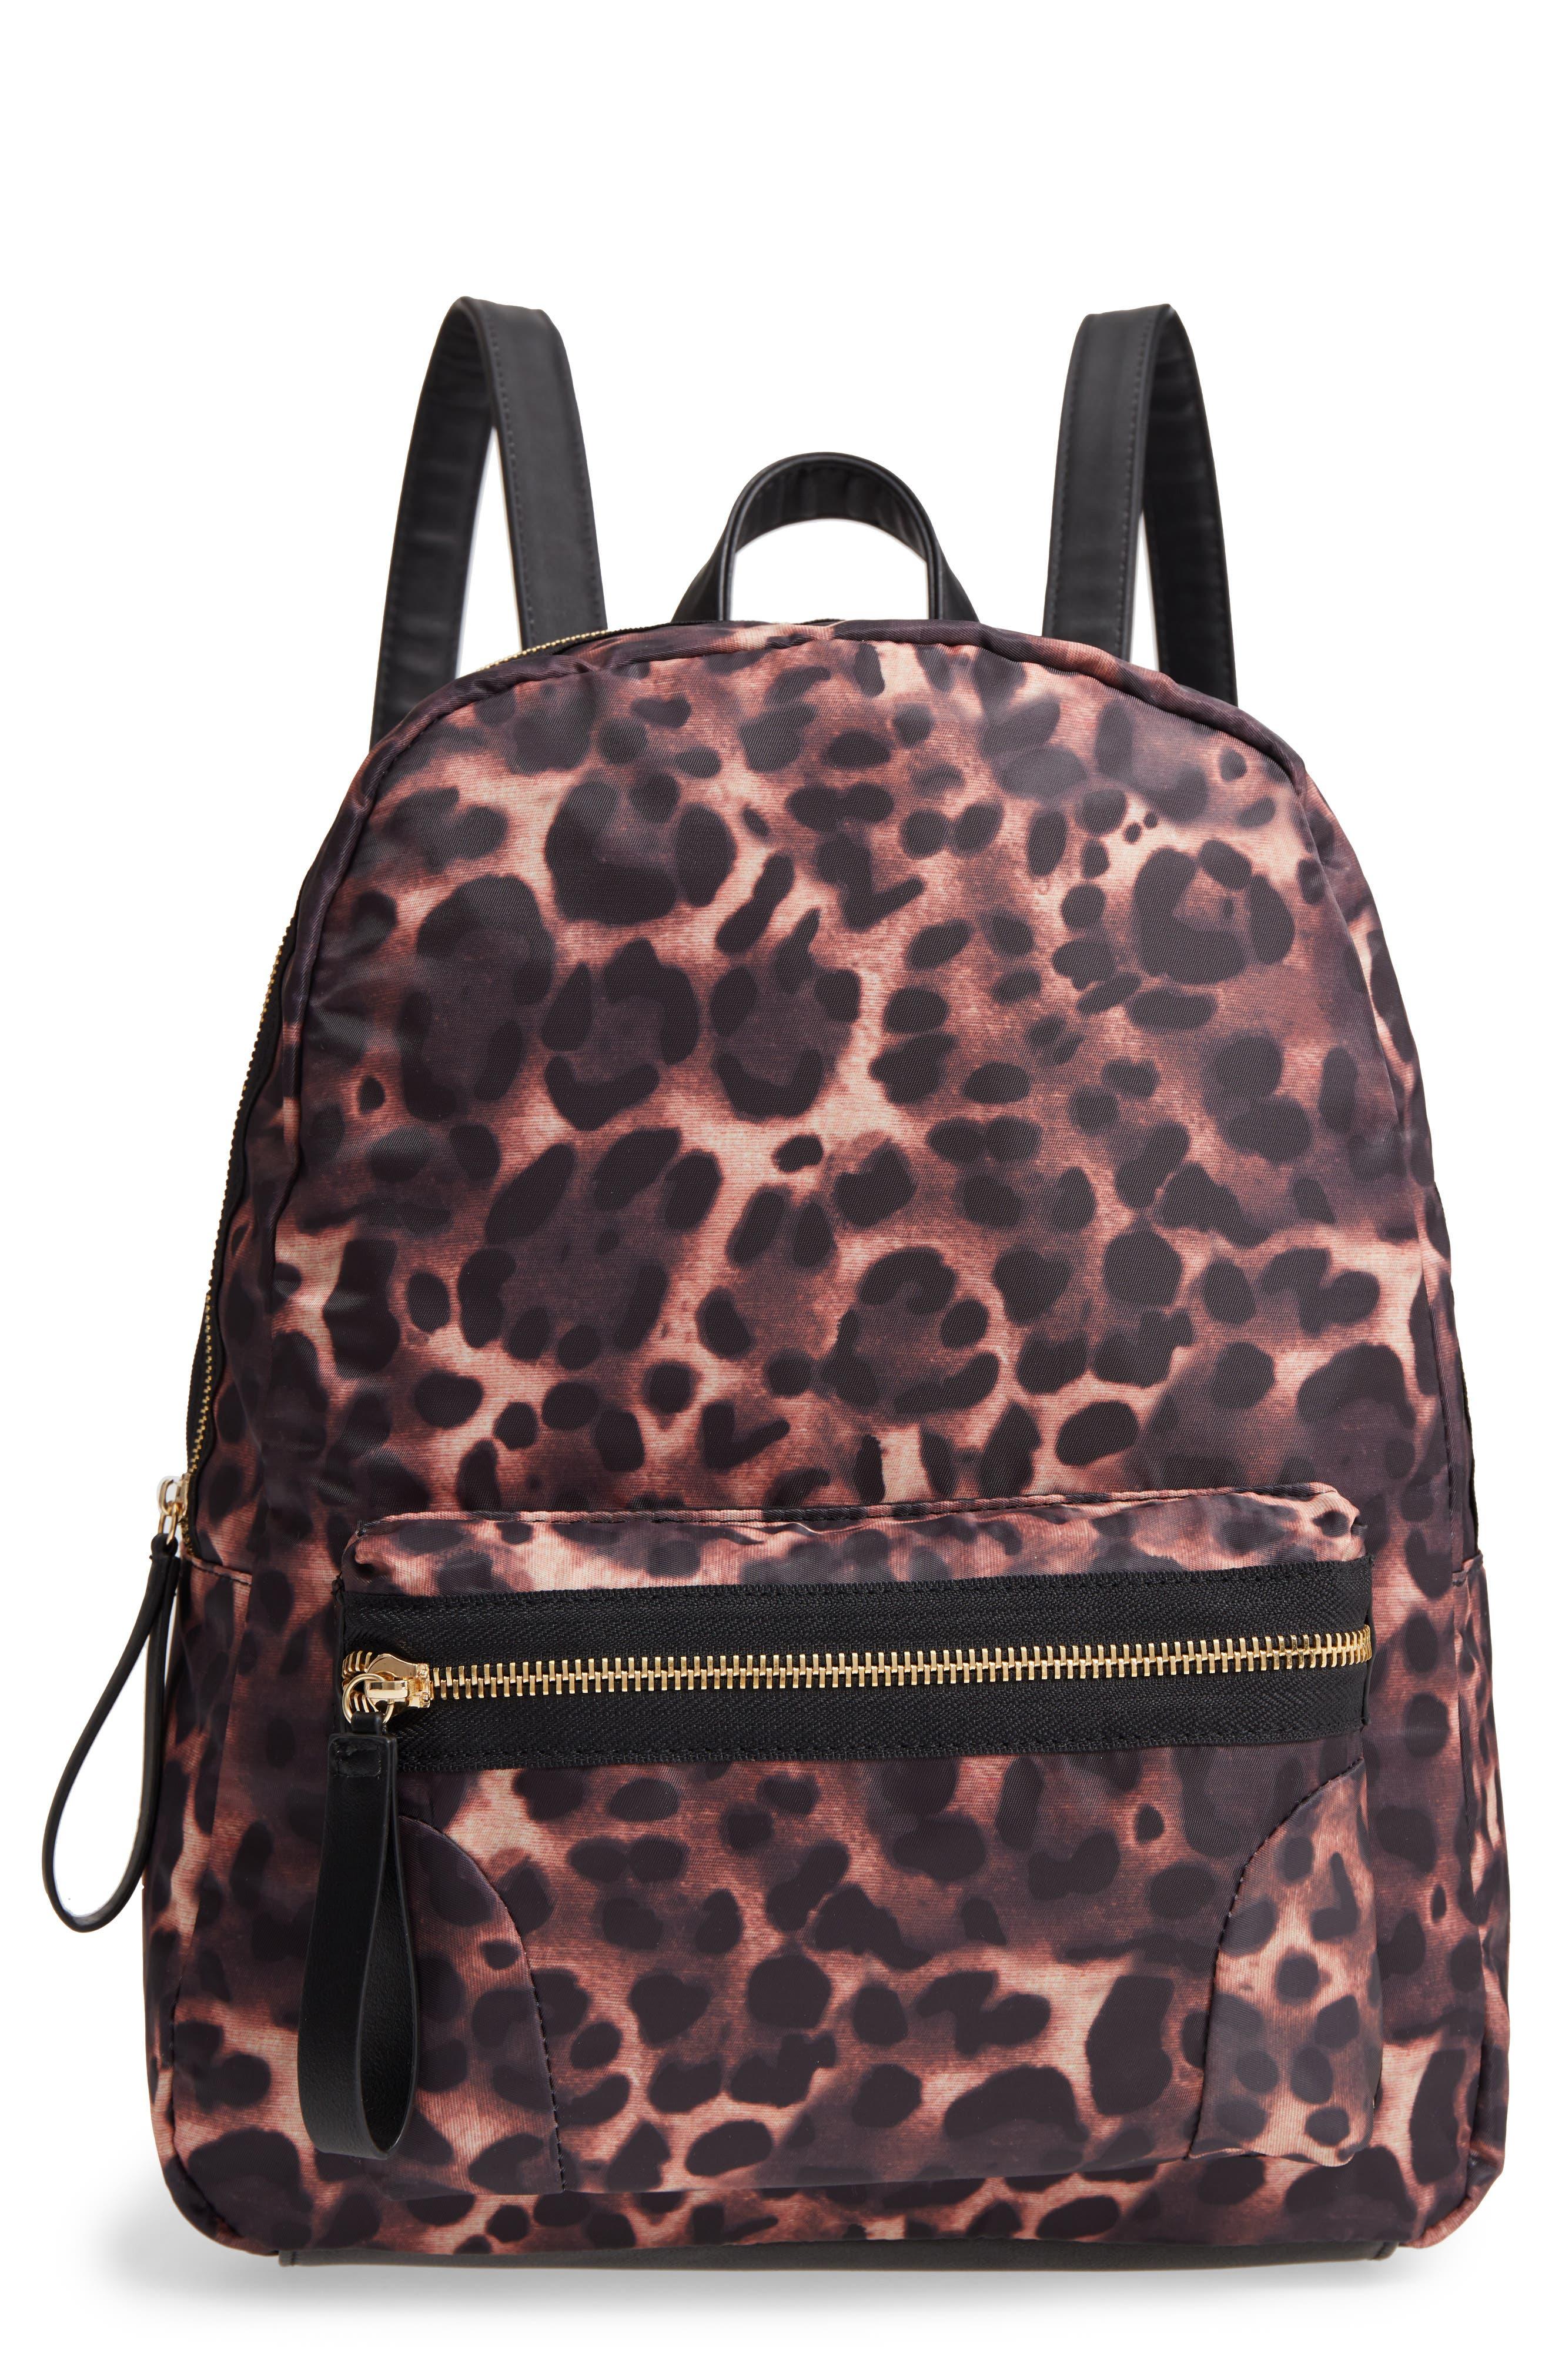 Leopard Print Nylon Backpack,                         Main,                         color, Leopard